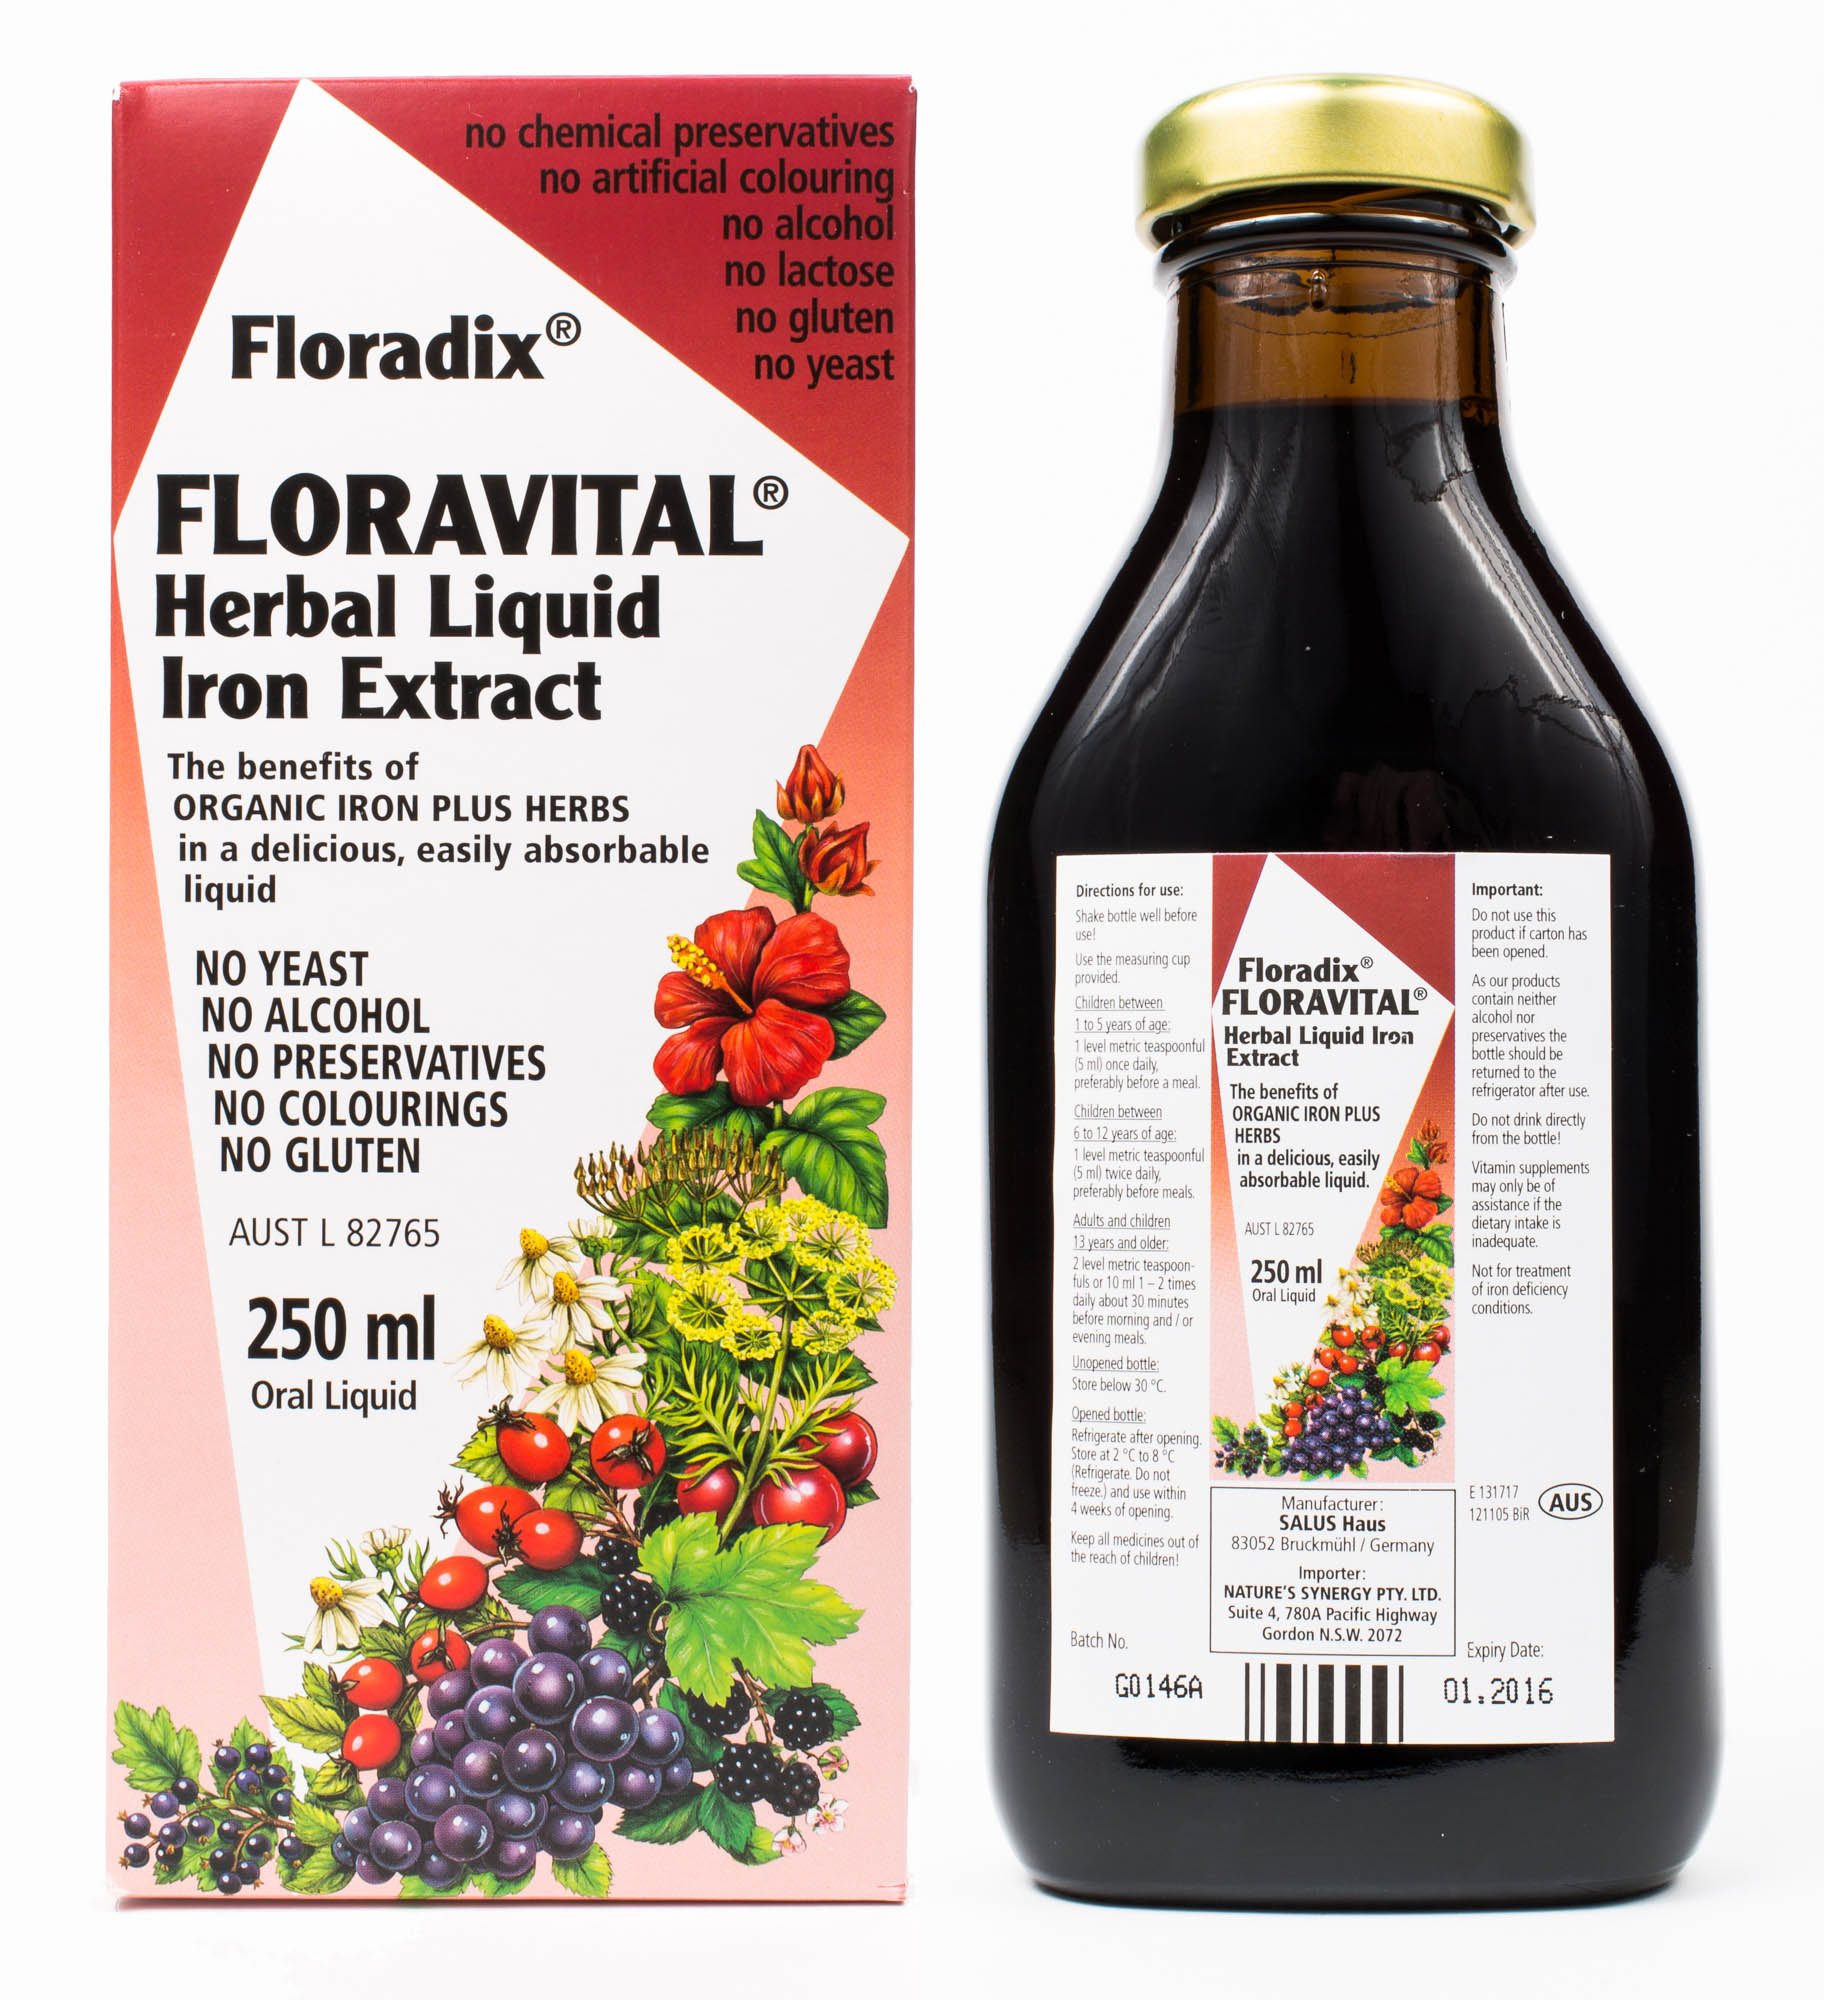 250ml-Floravital-Herbal-Liquid-Iron-Extract_62.jpg